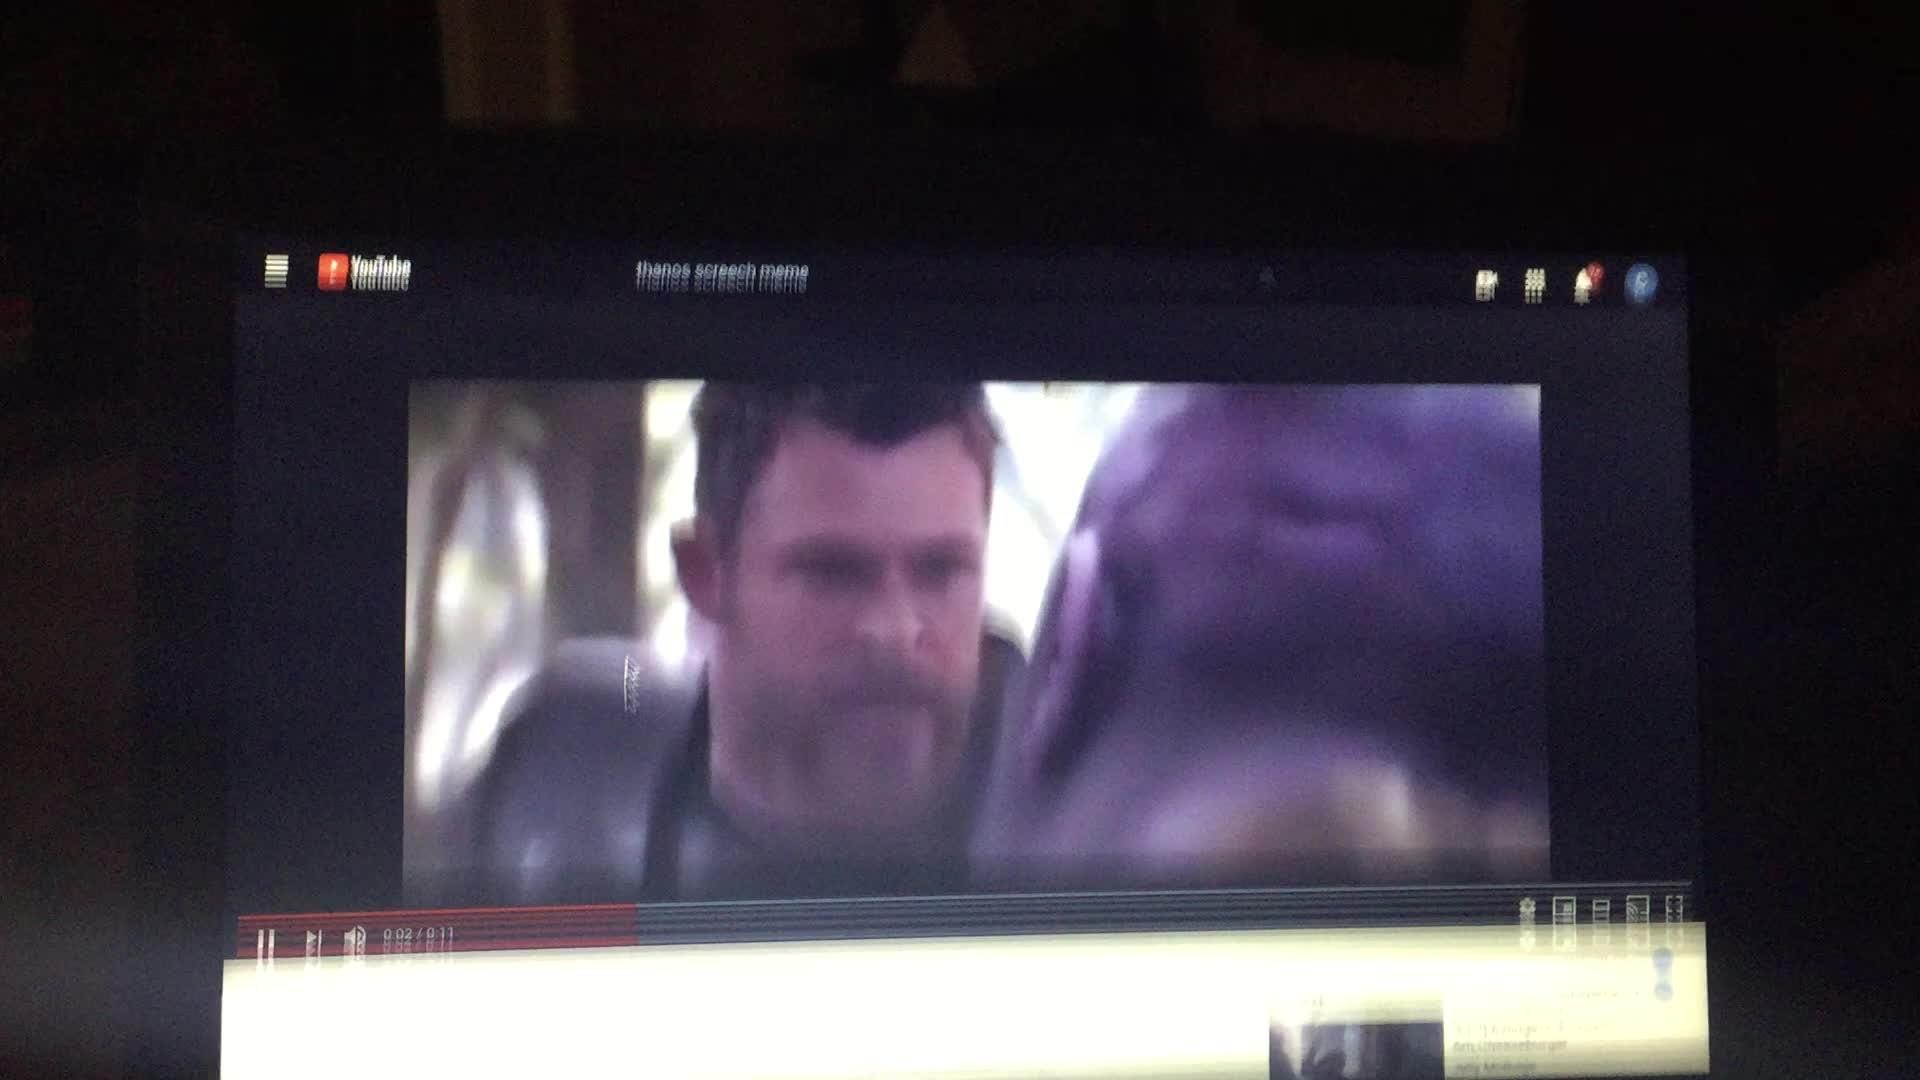 Battlefield: General - When you bayonet in Battlefield 1 video cover image 0